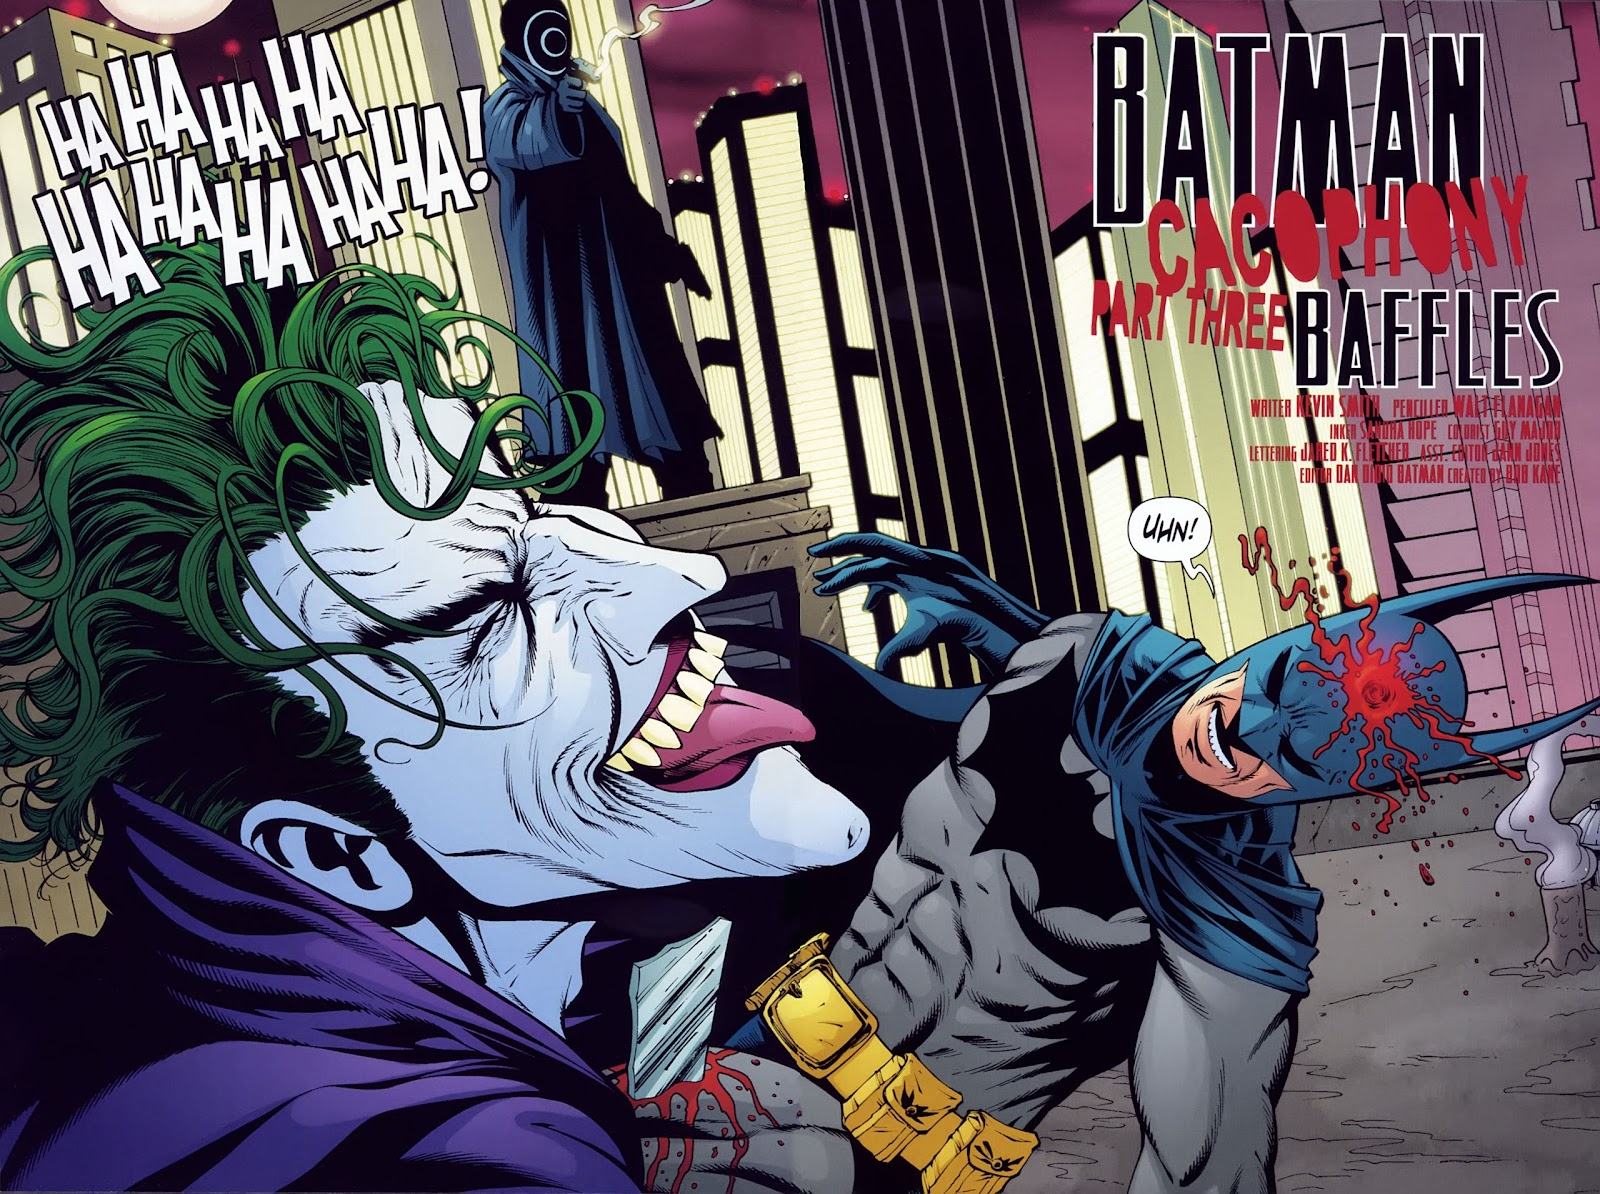 Cacophony Batman